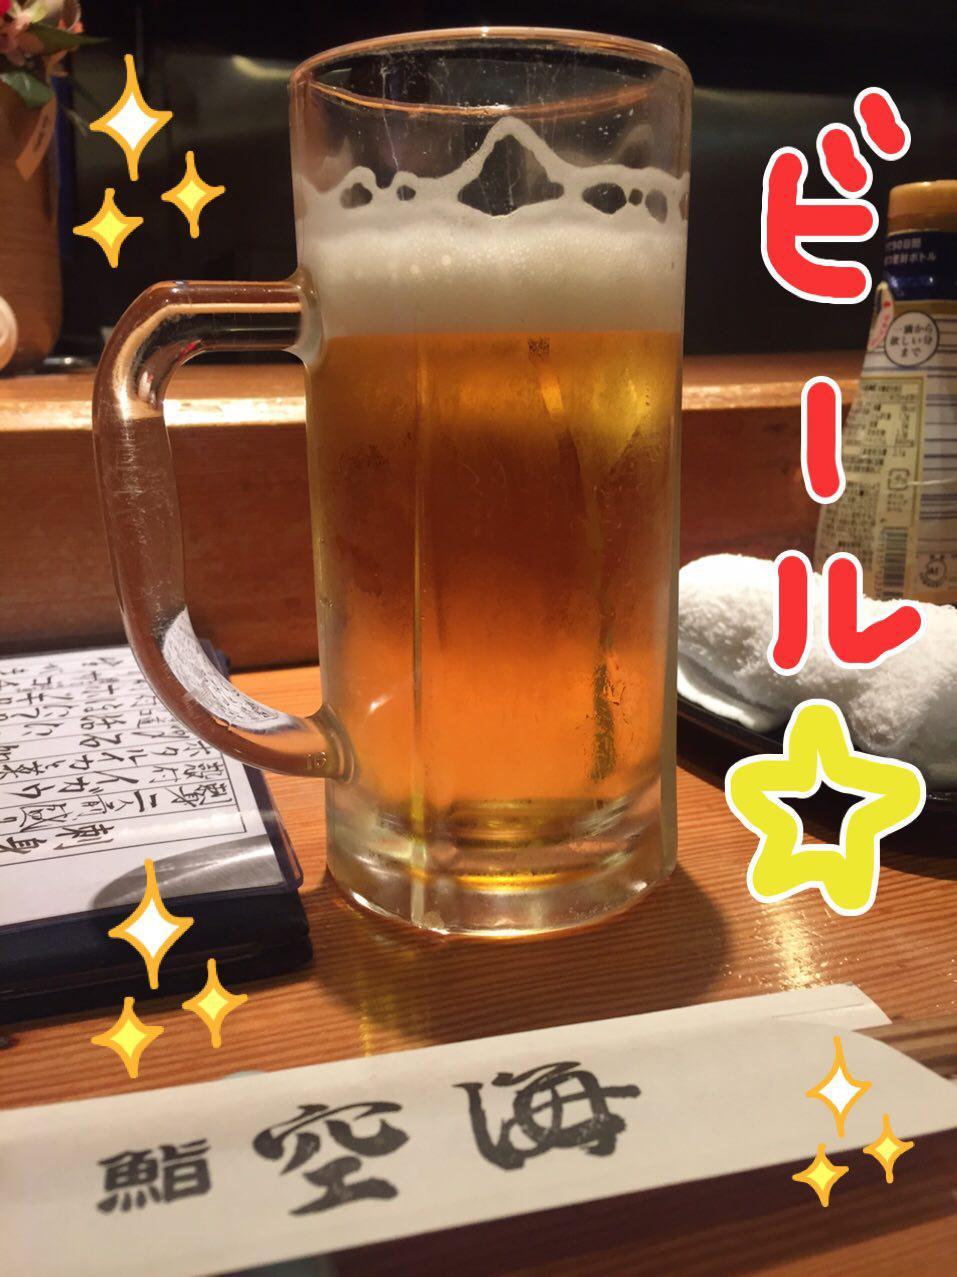 photo_2017-04-14_23-09-48.jpg